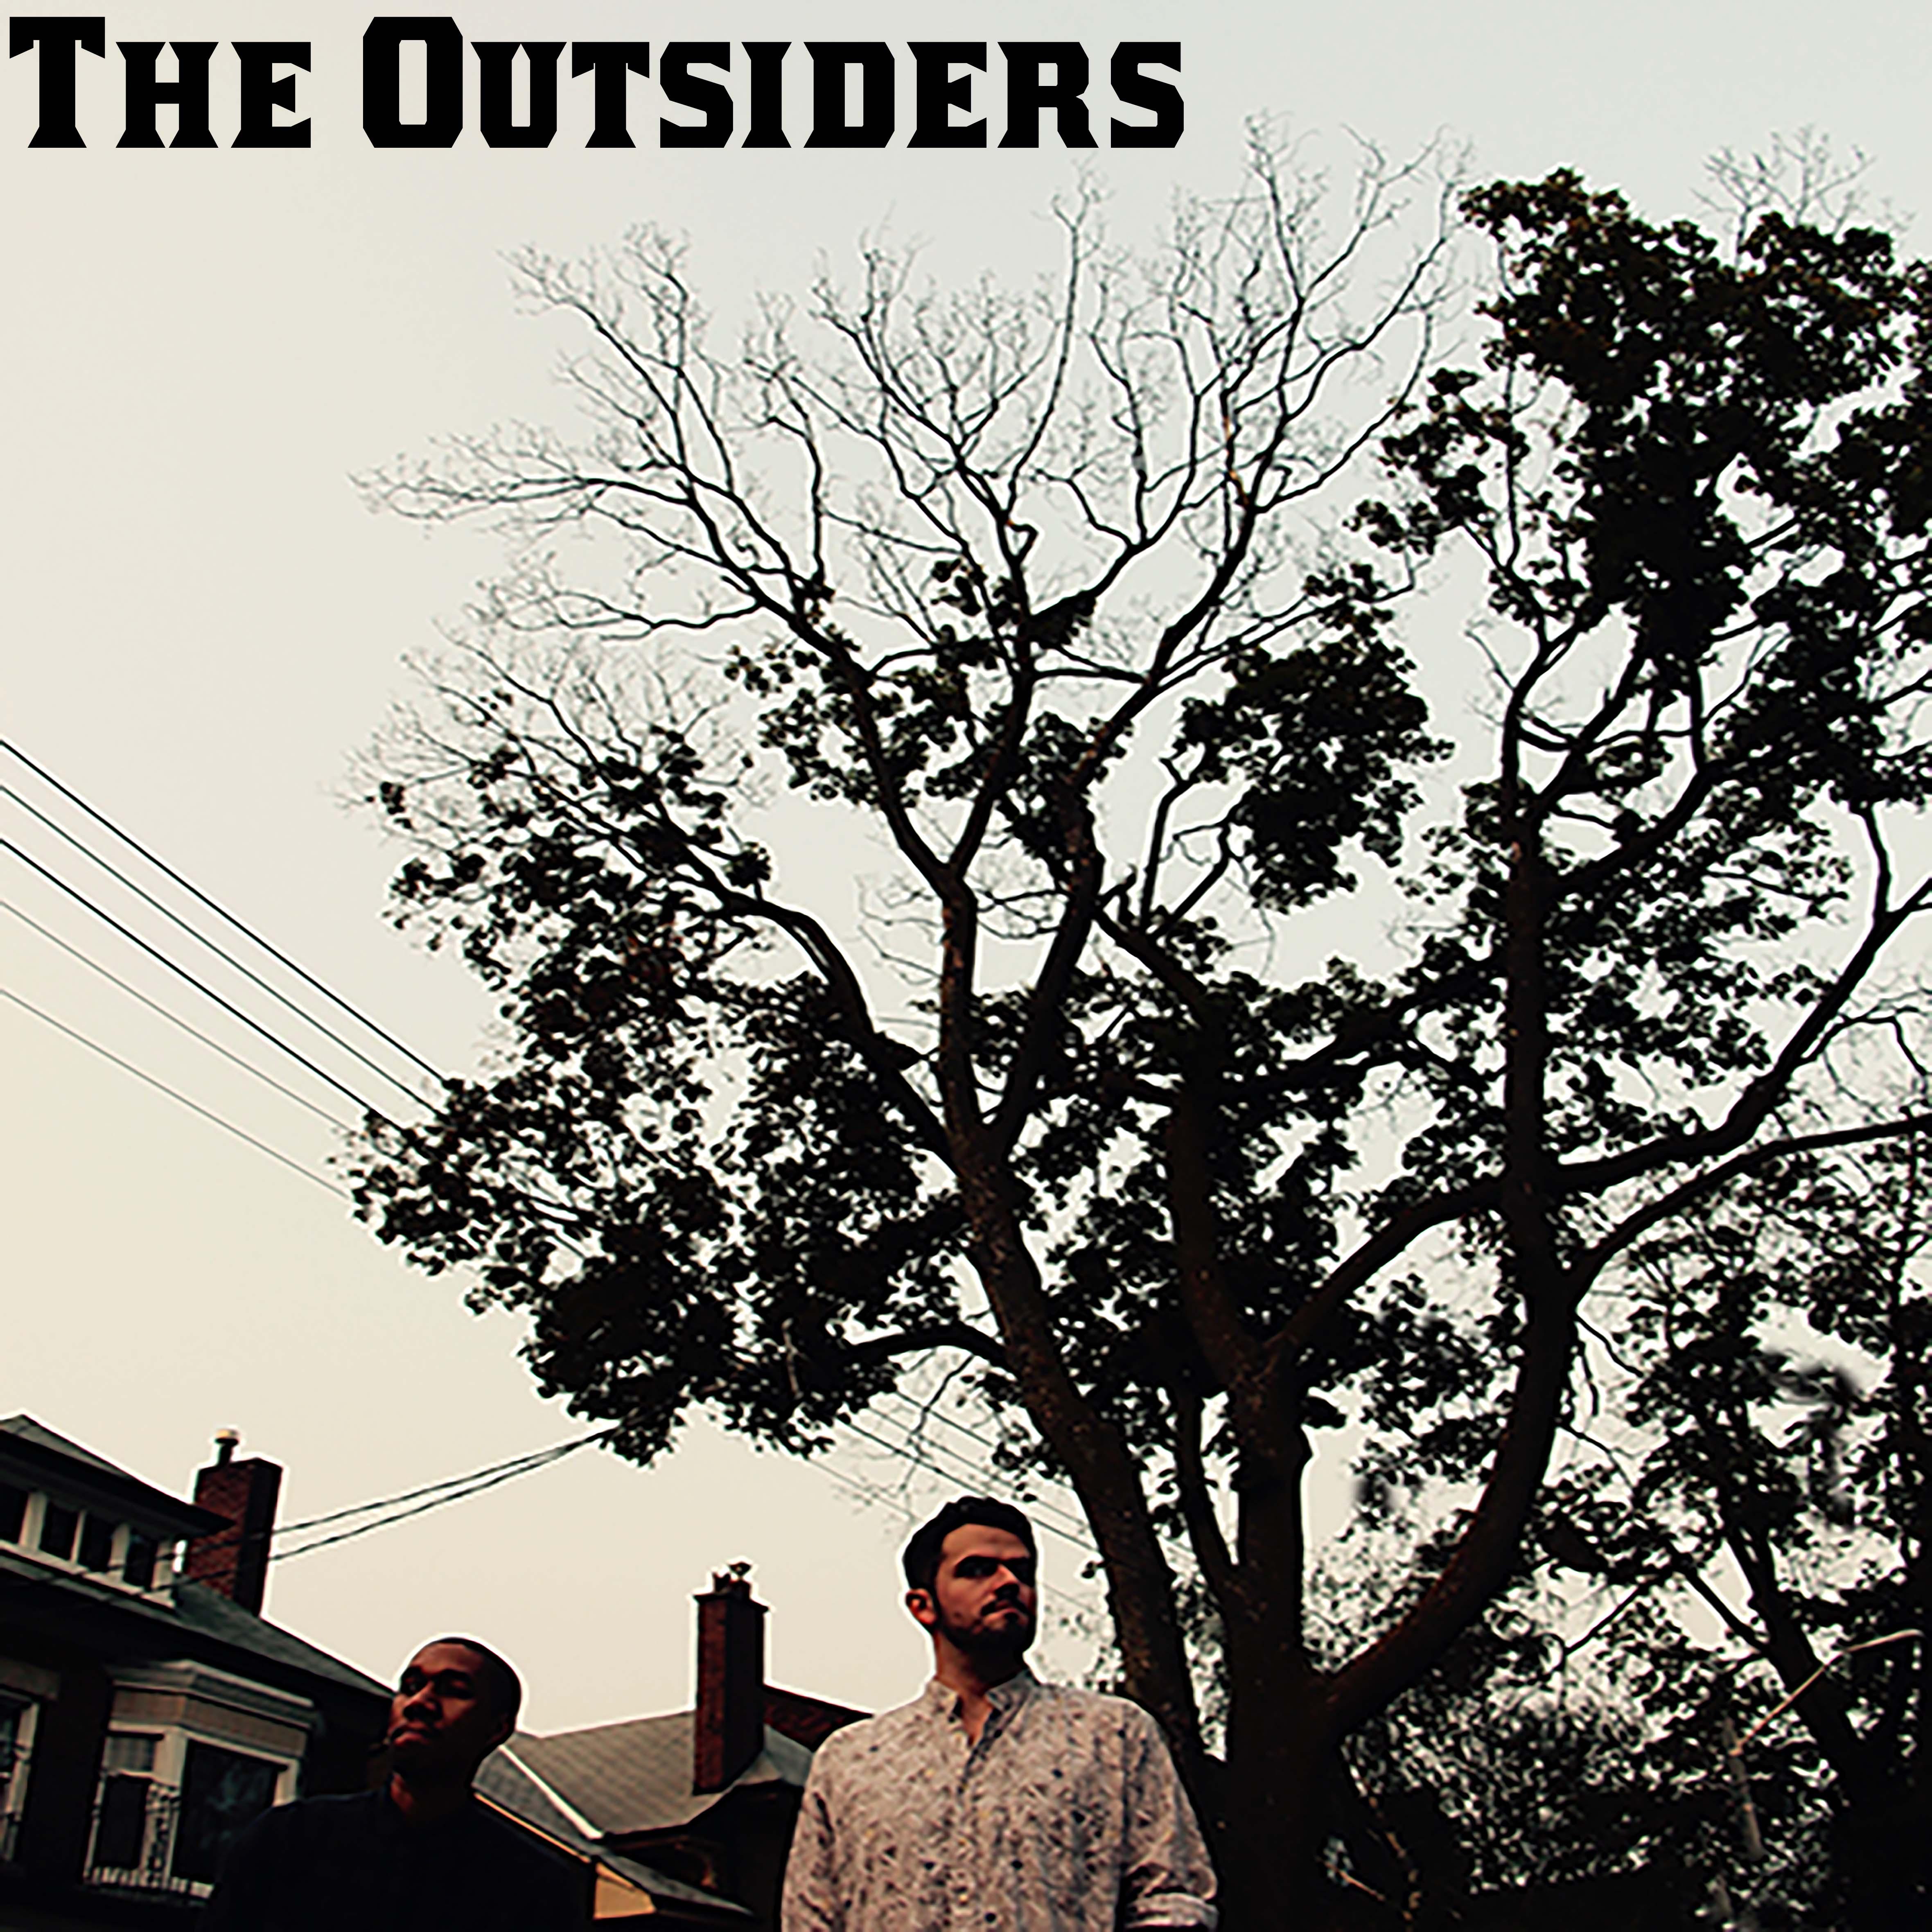 The Outsiders (J Shiltz & Royce Birth) - The Outsiders [album]